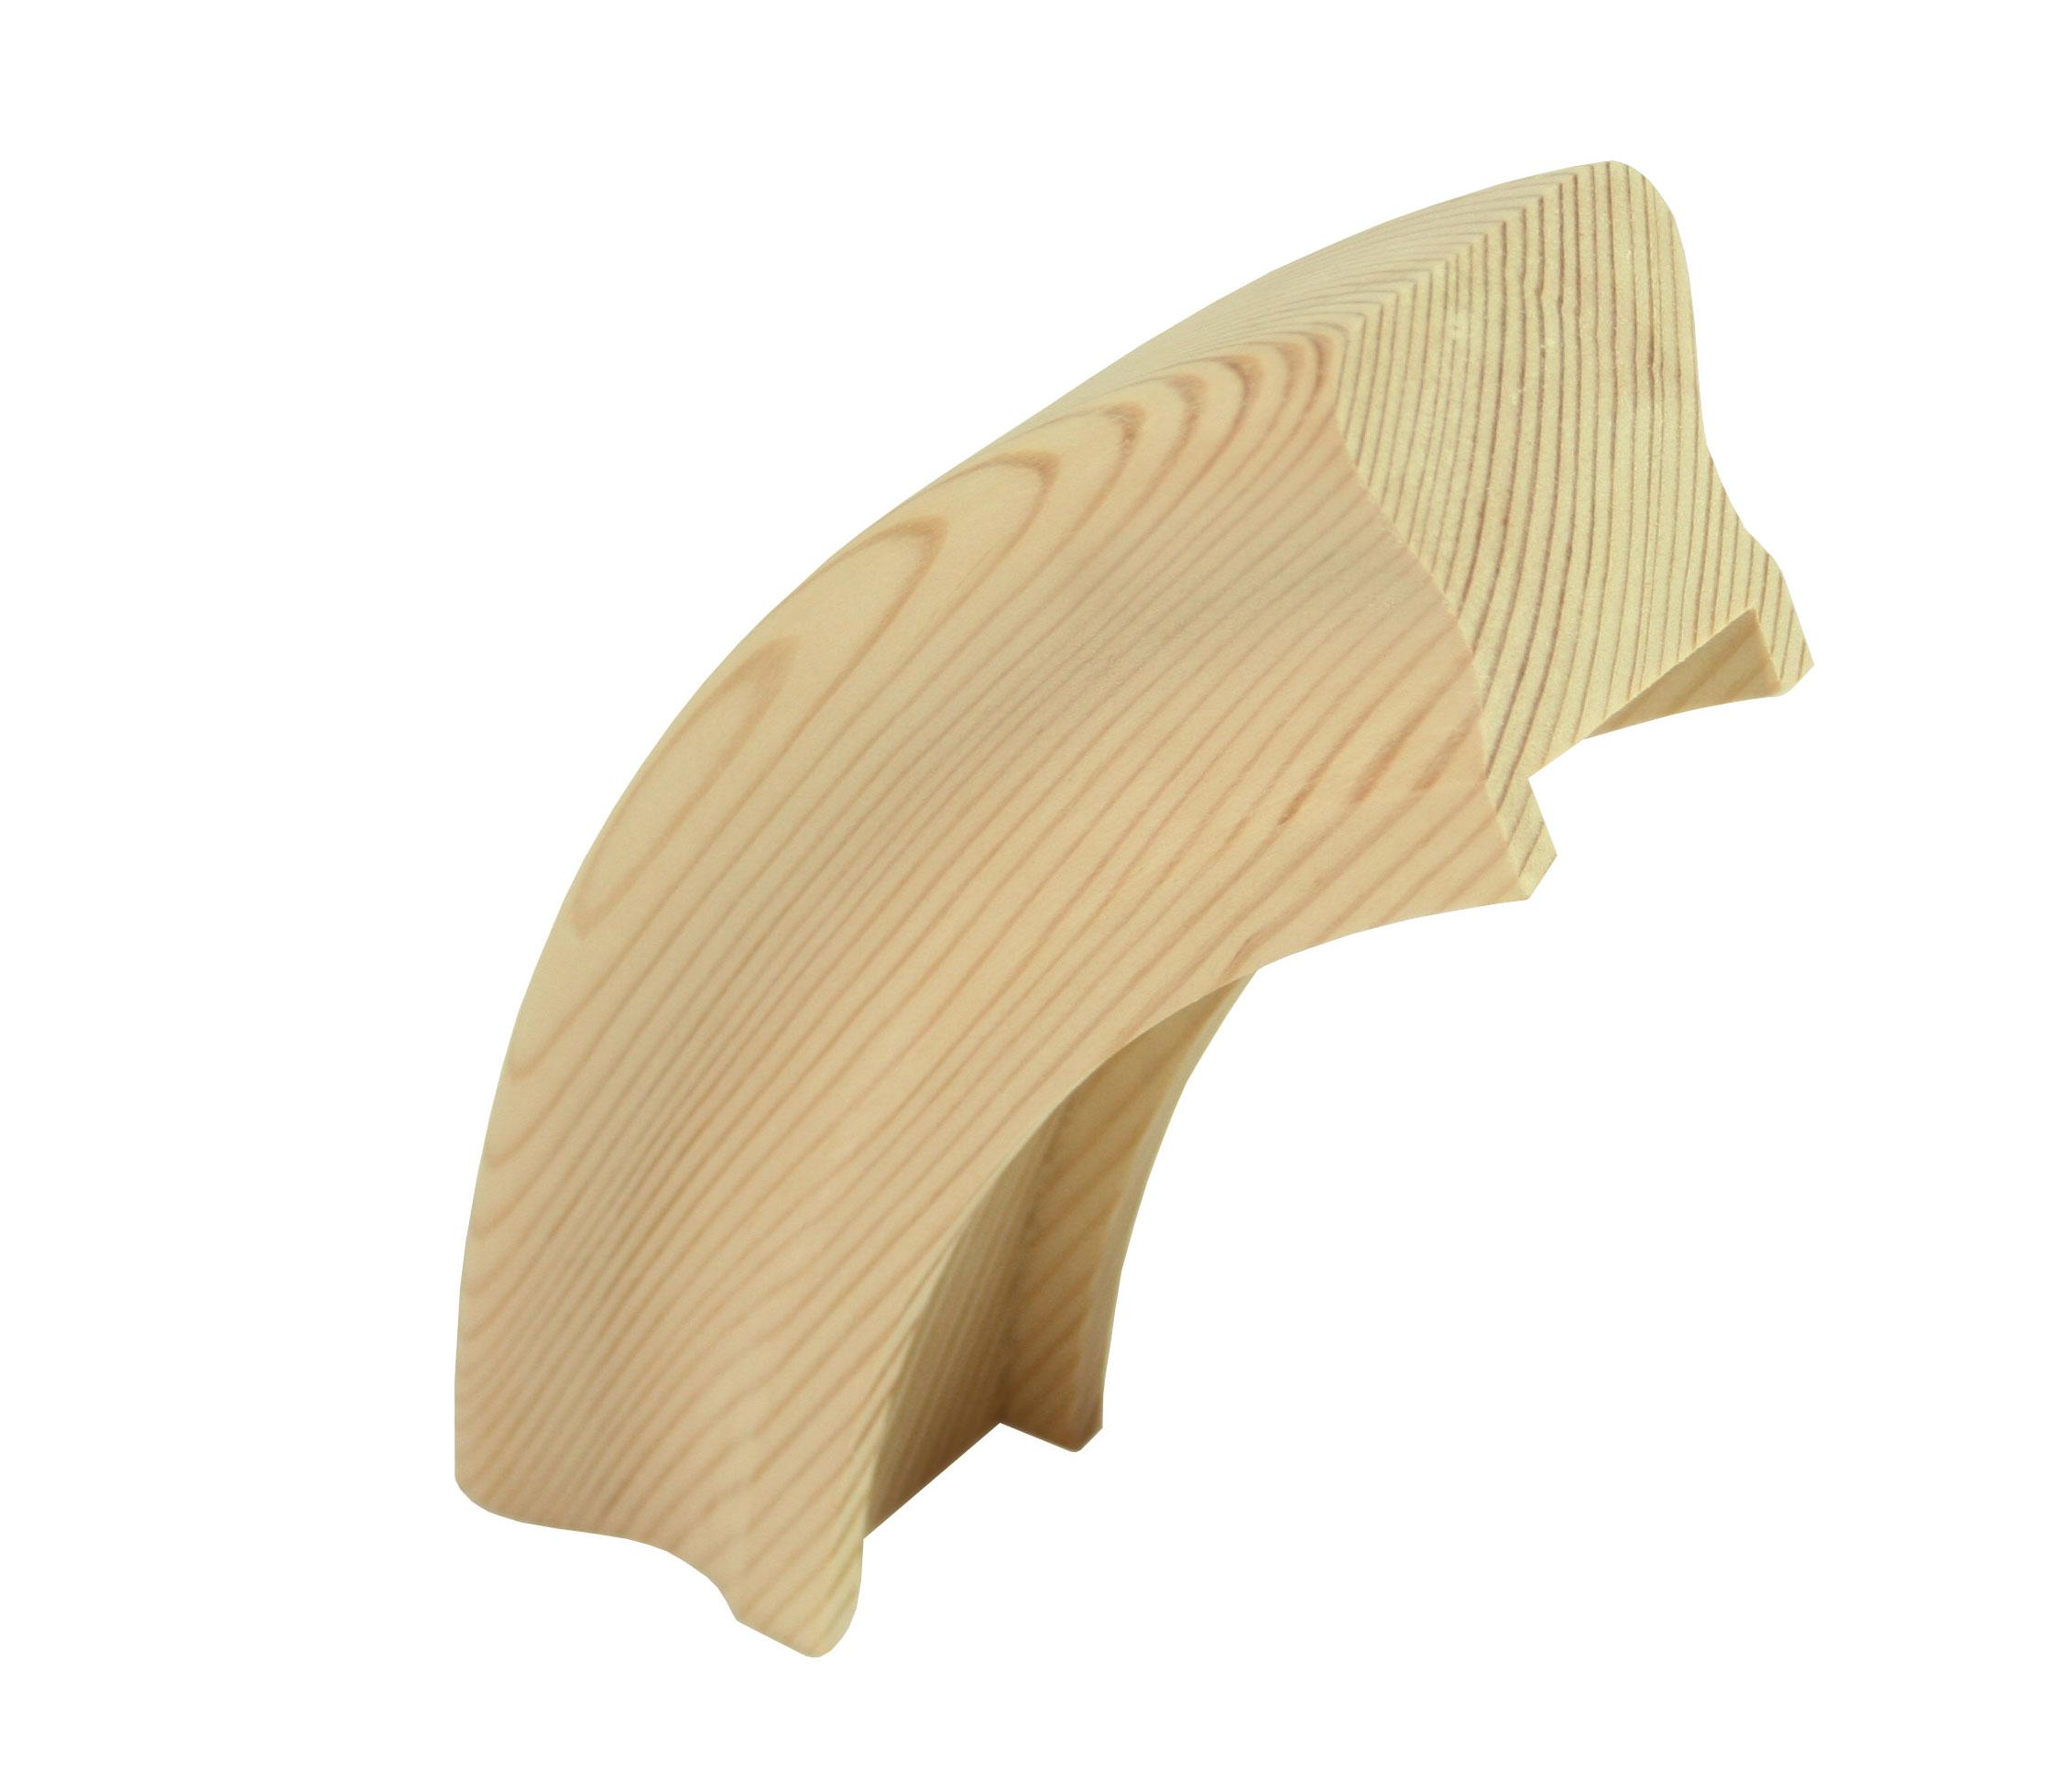 TRADEMARK Pine Convex Ramp - FSC Certified